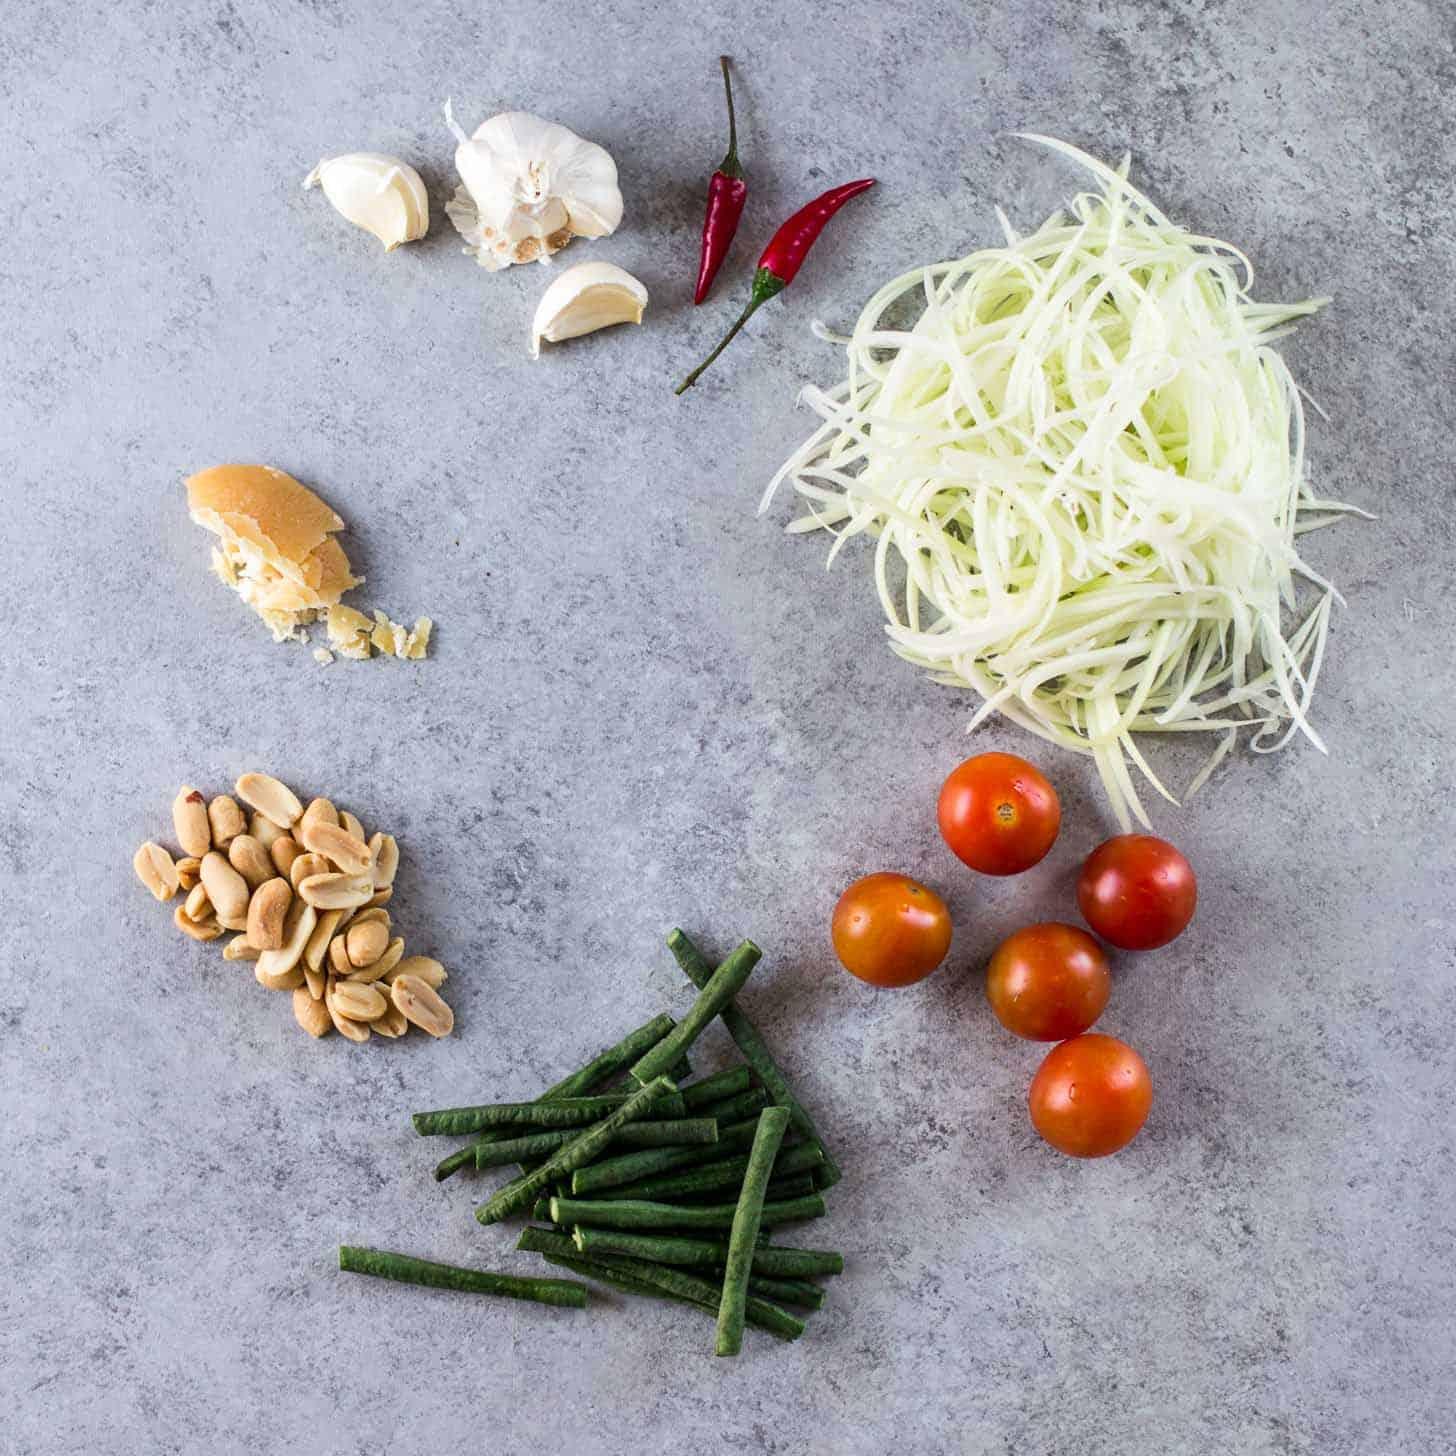 Ingredients for Green Papaya Salad on a grey countertop